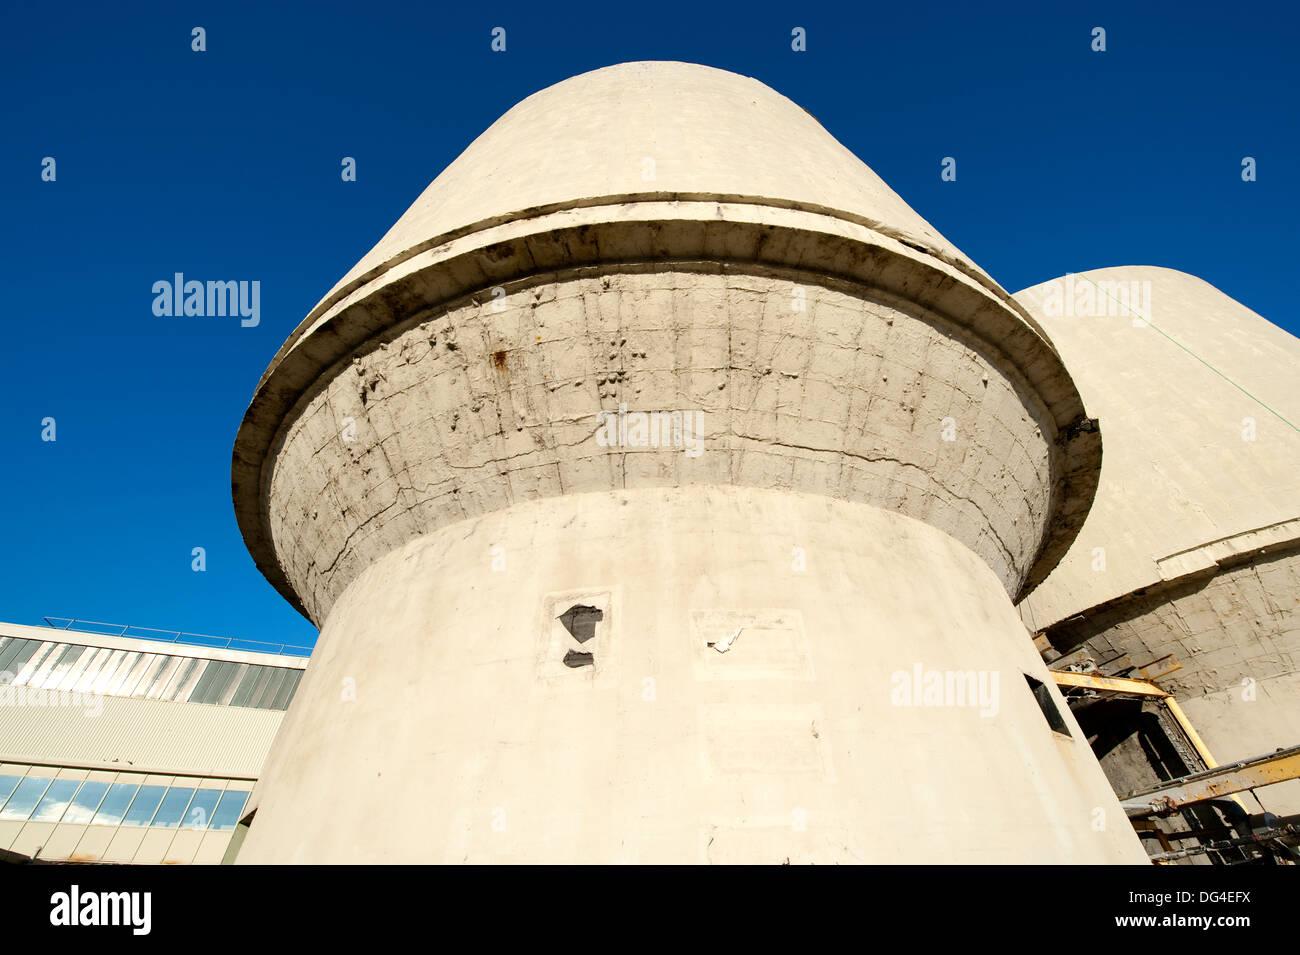 Imposing Threatening industrial architecture - Stock Image